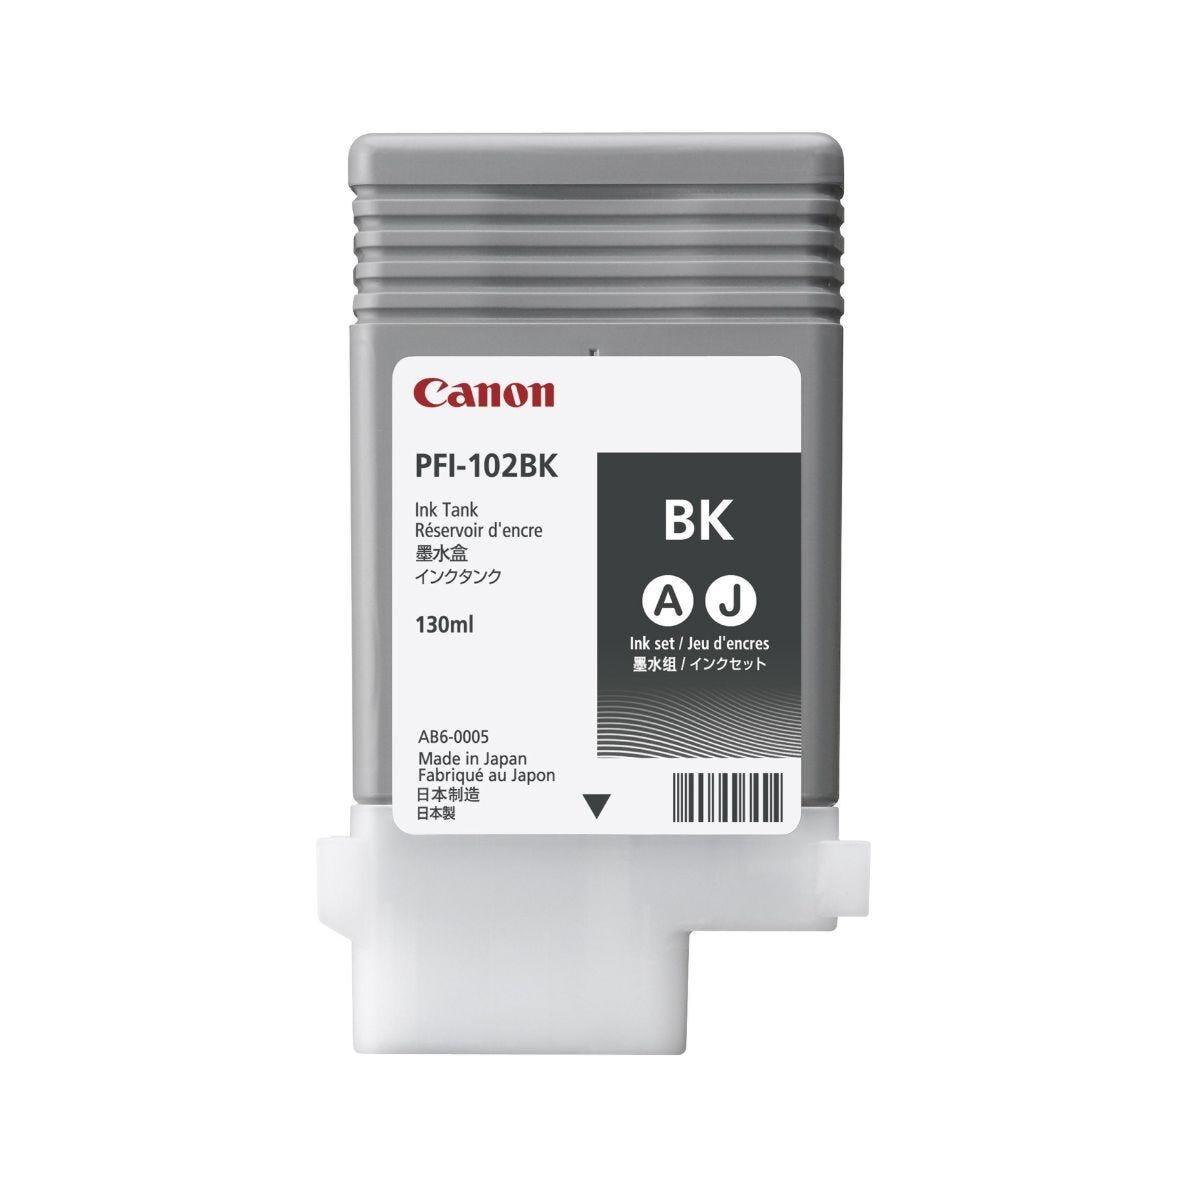 Canon IPF600 Black Ink Tank